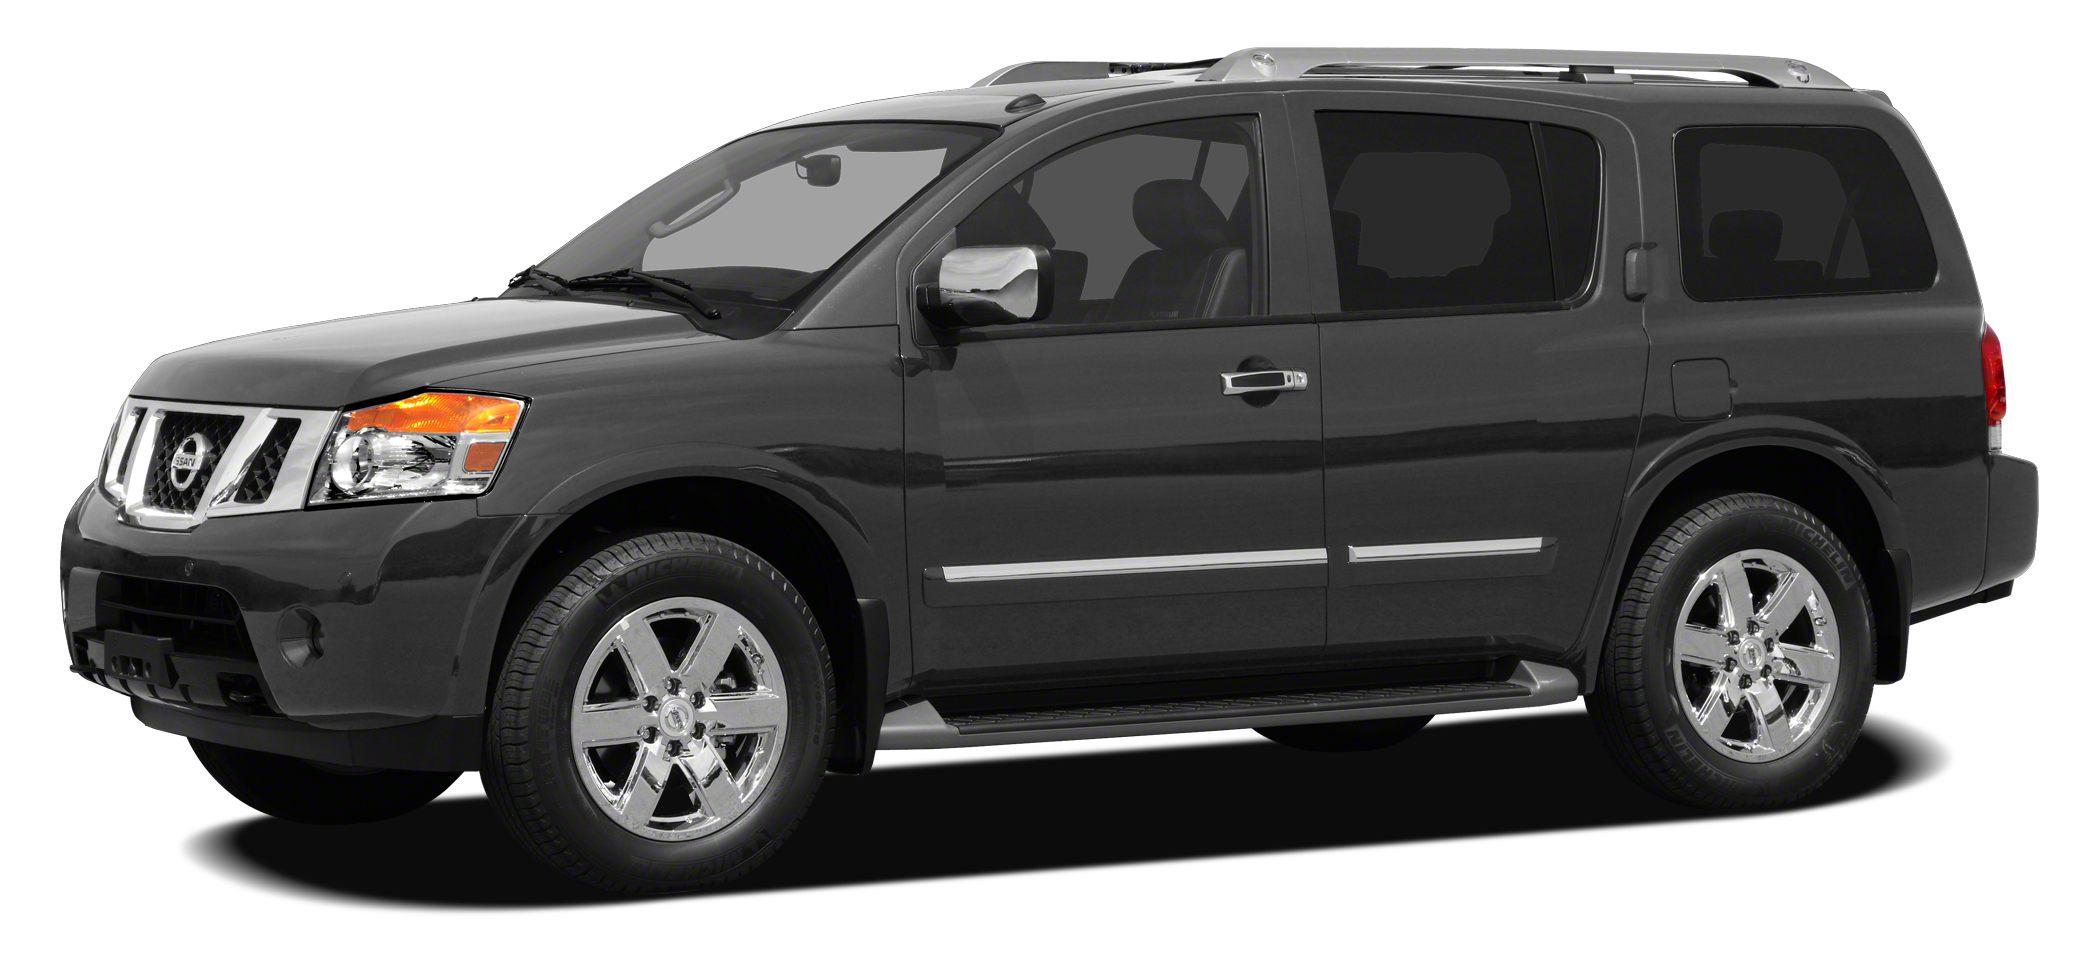 2011 Nissan Armada SV Miles 51929Color Smoke Stock M5651A VIN 5N1BA0ND3BN618657